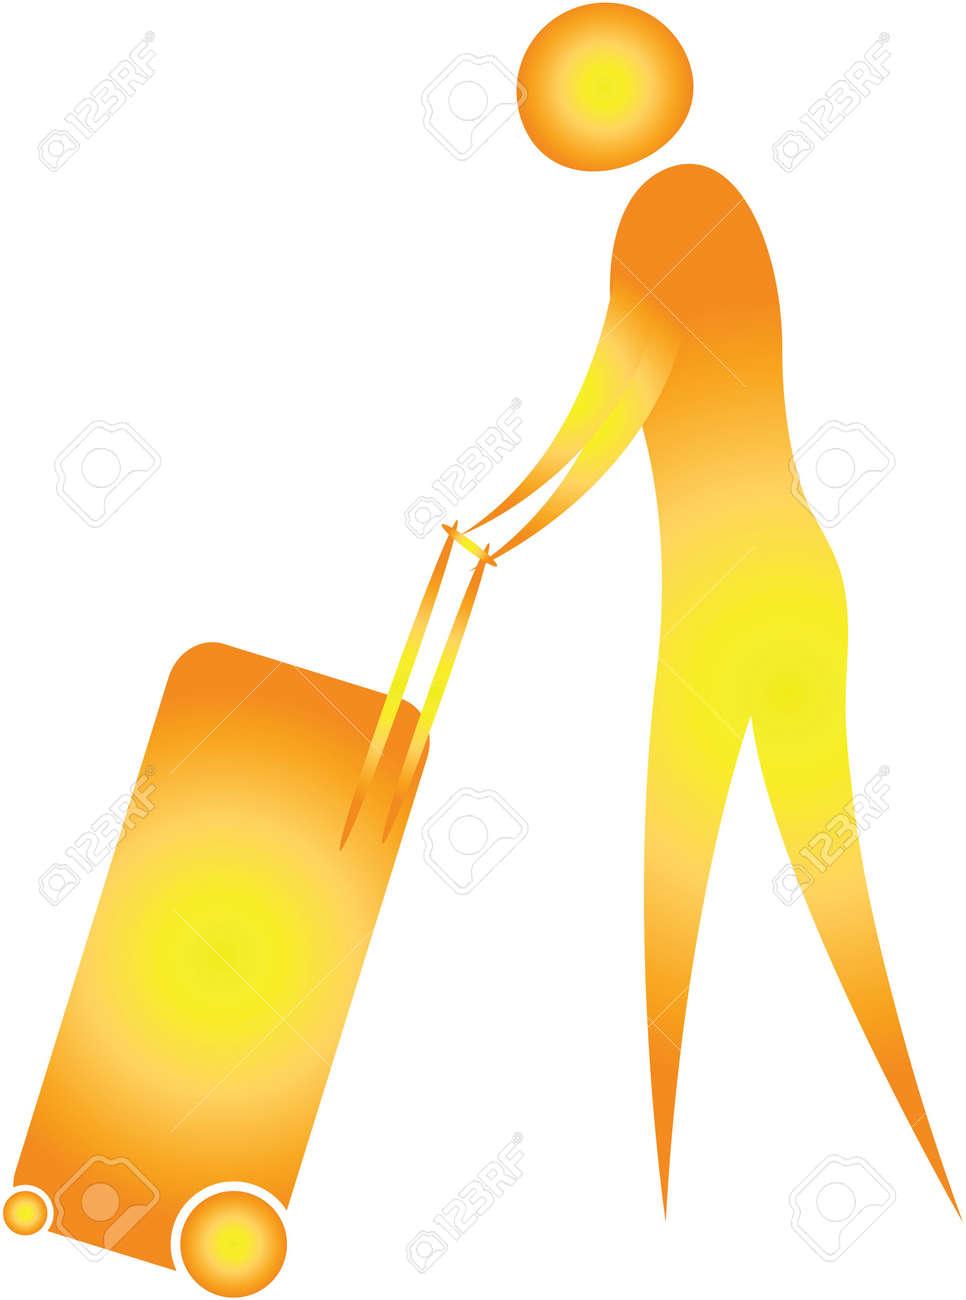 human pushing luggage trolley Stock Photo - 7596973